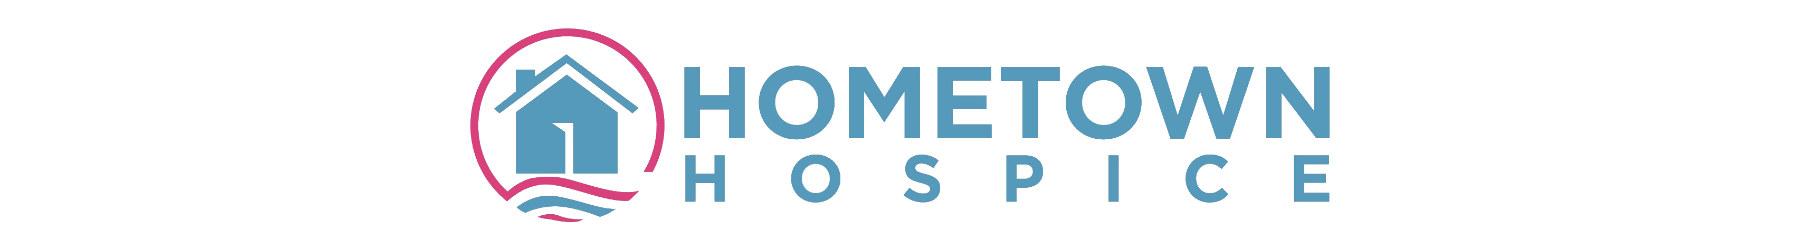 Hometown Hospice logo